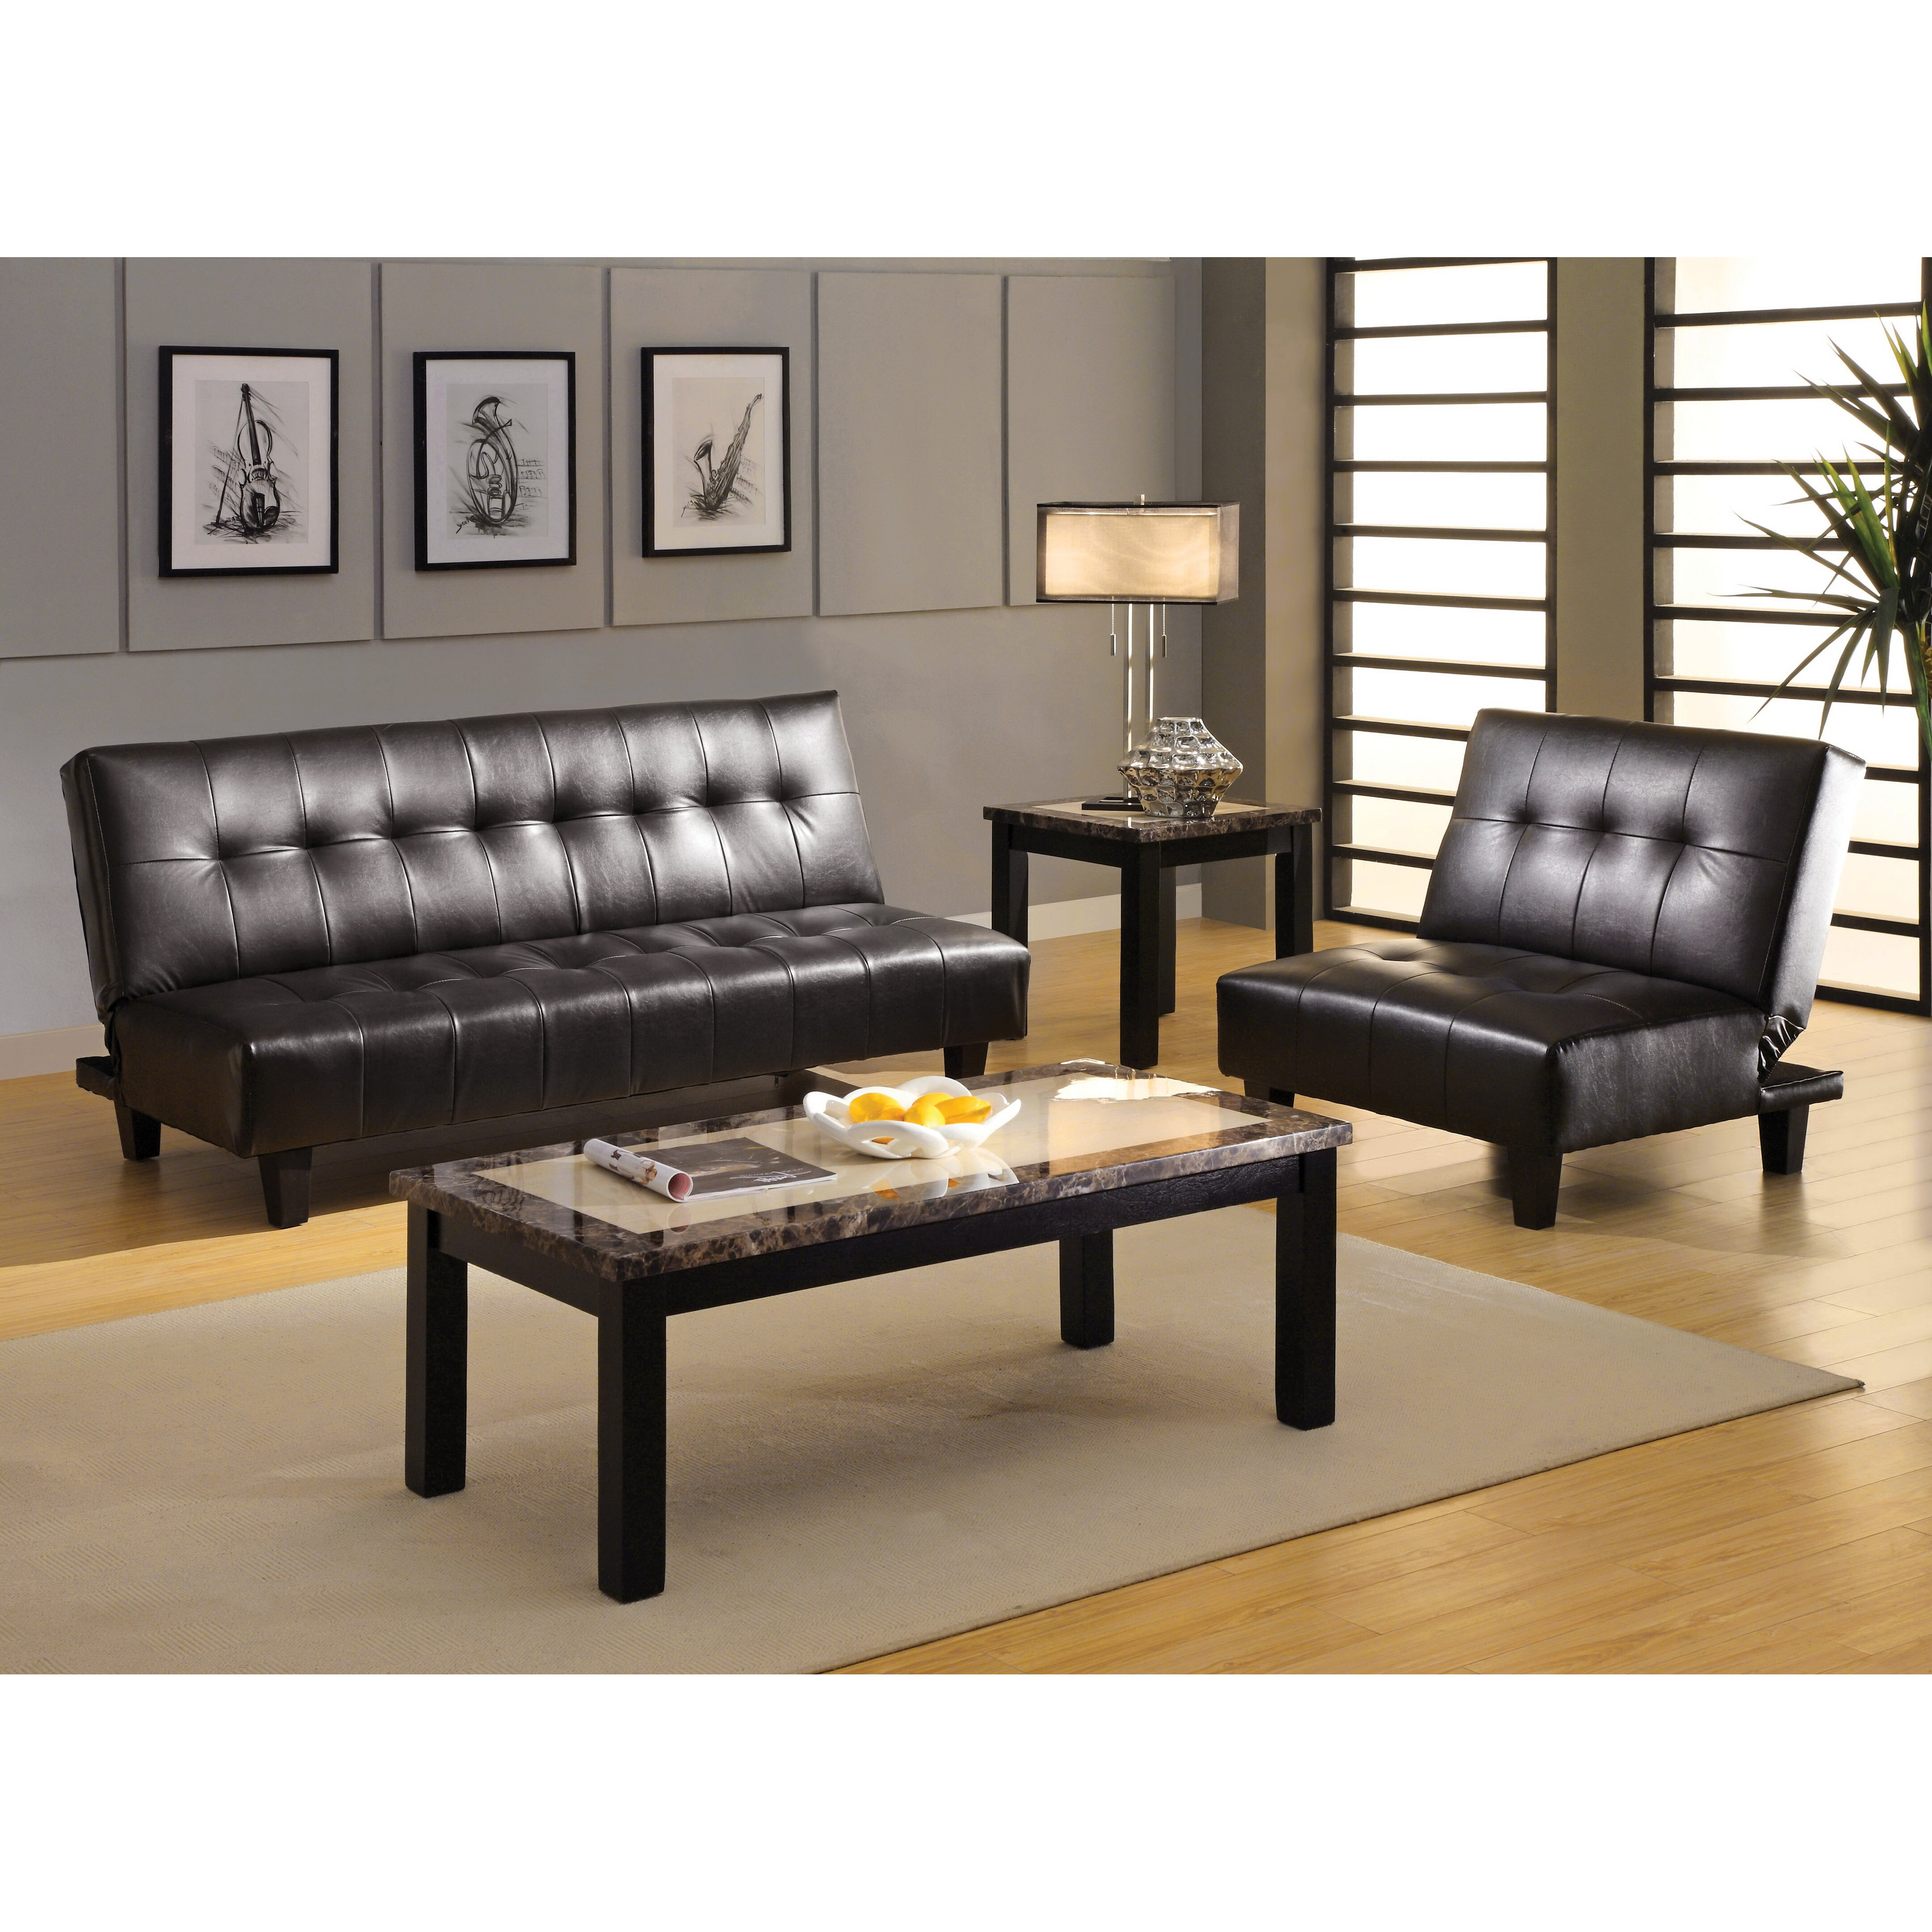 Hokku designs belmont living room collection reviews for Hokku designs living room furniture